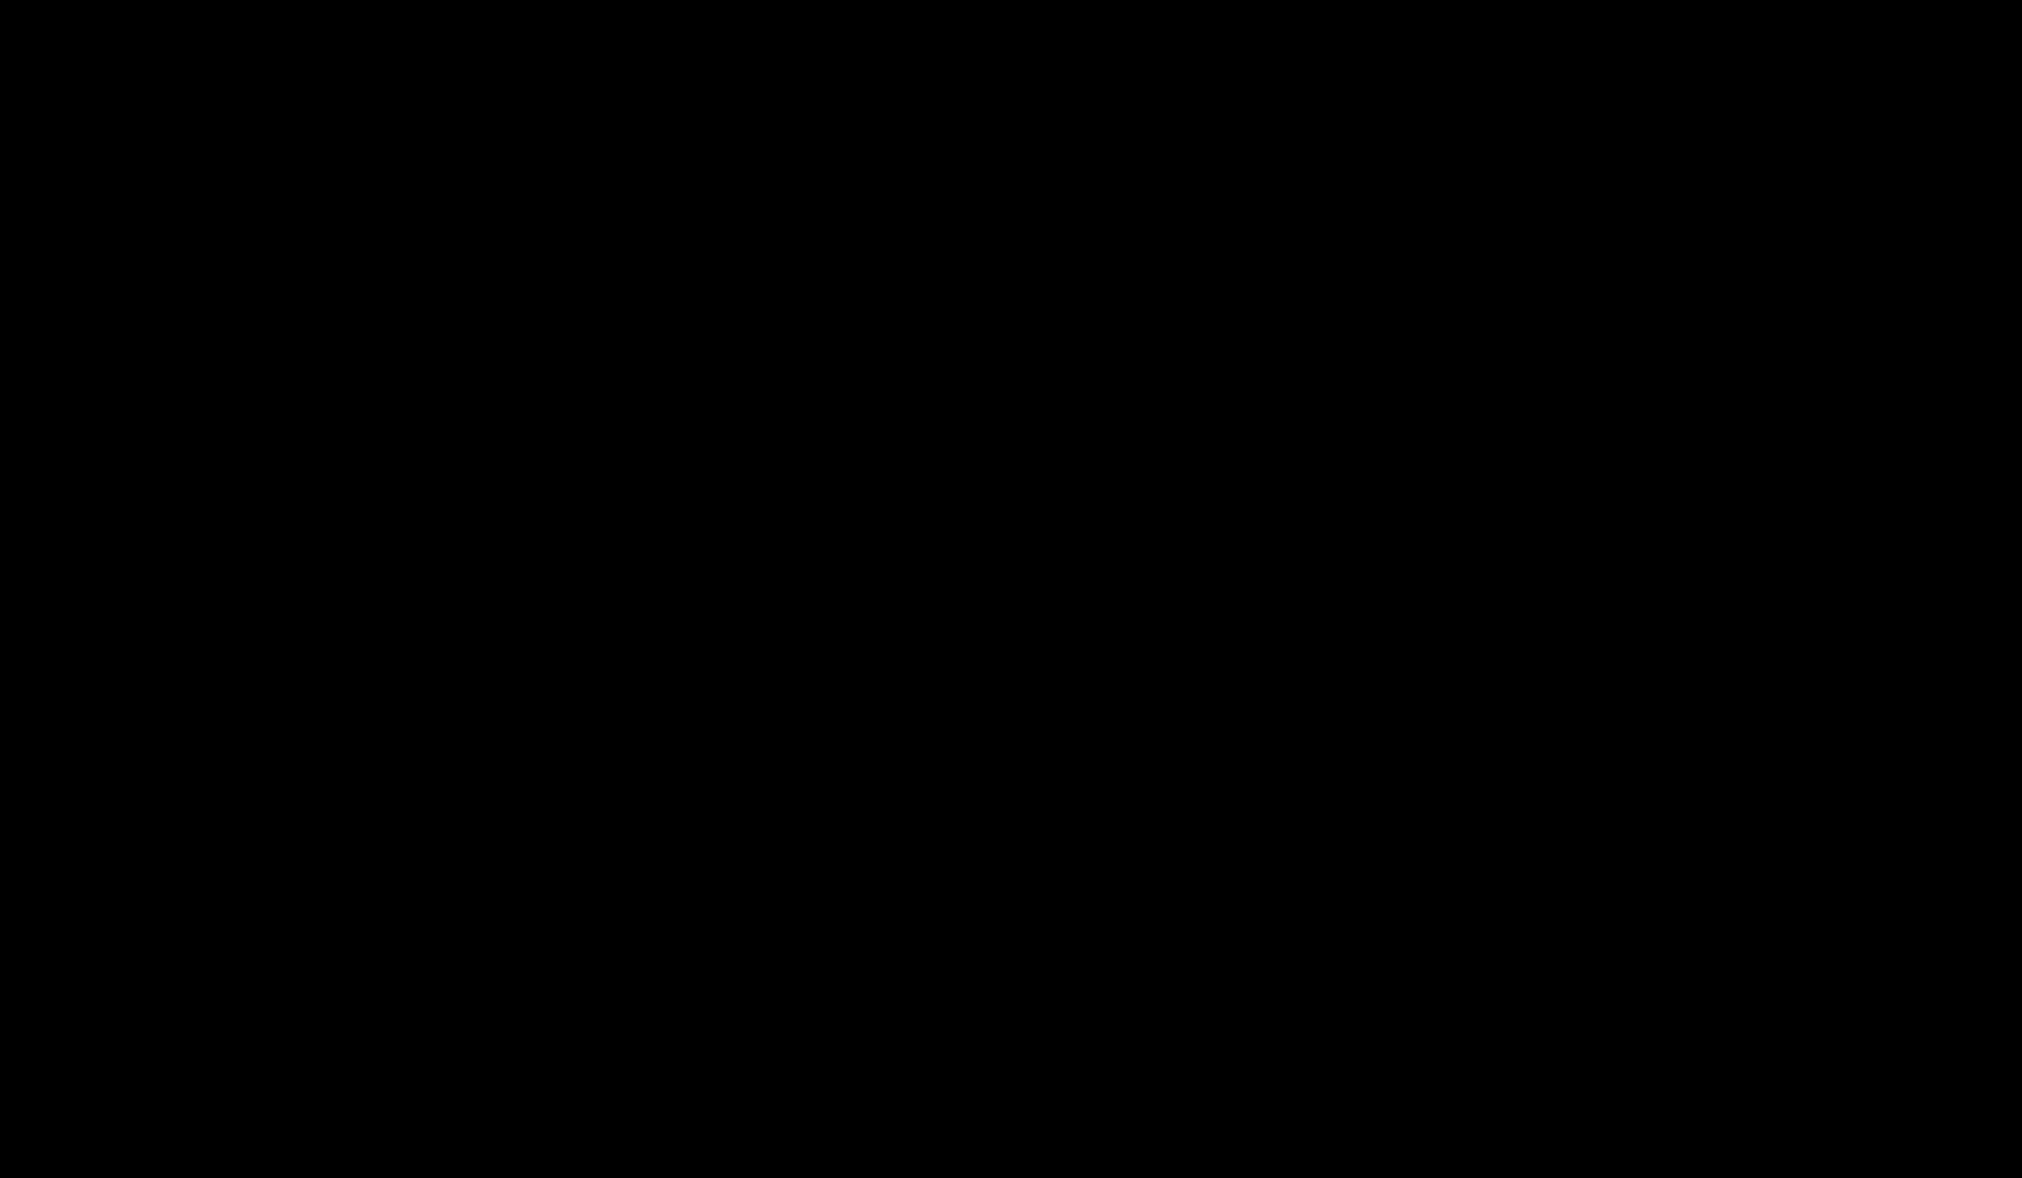 Logo_2022x1178